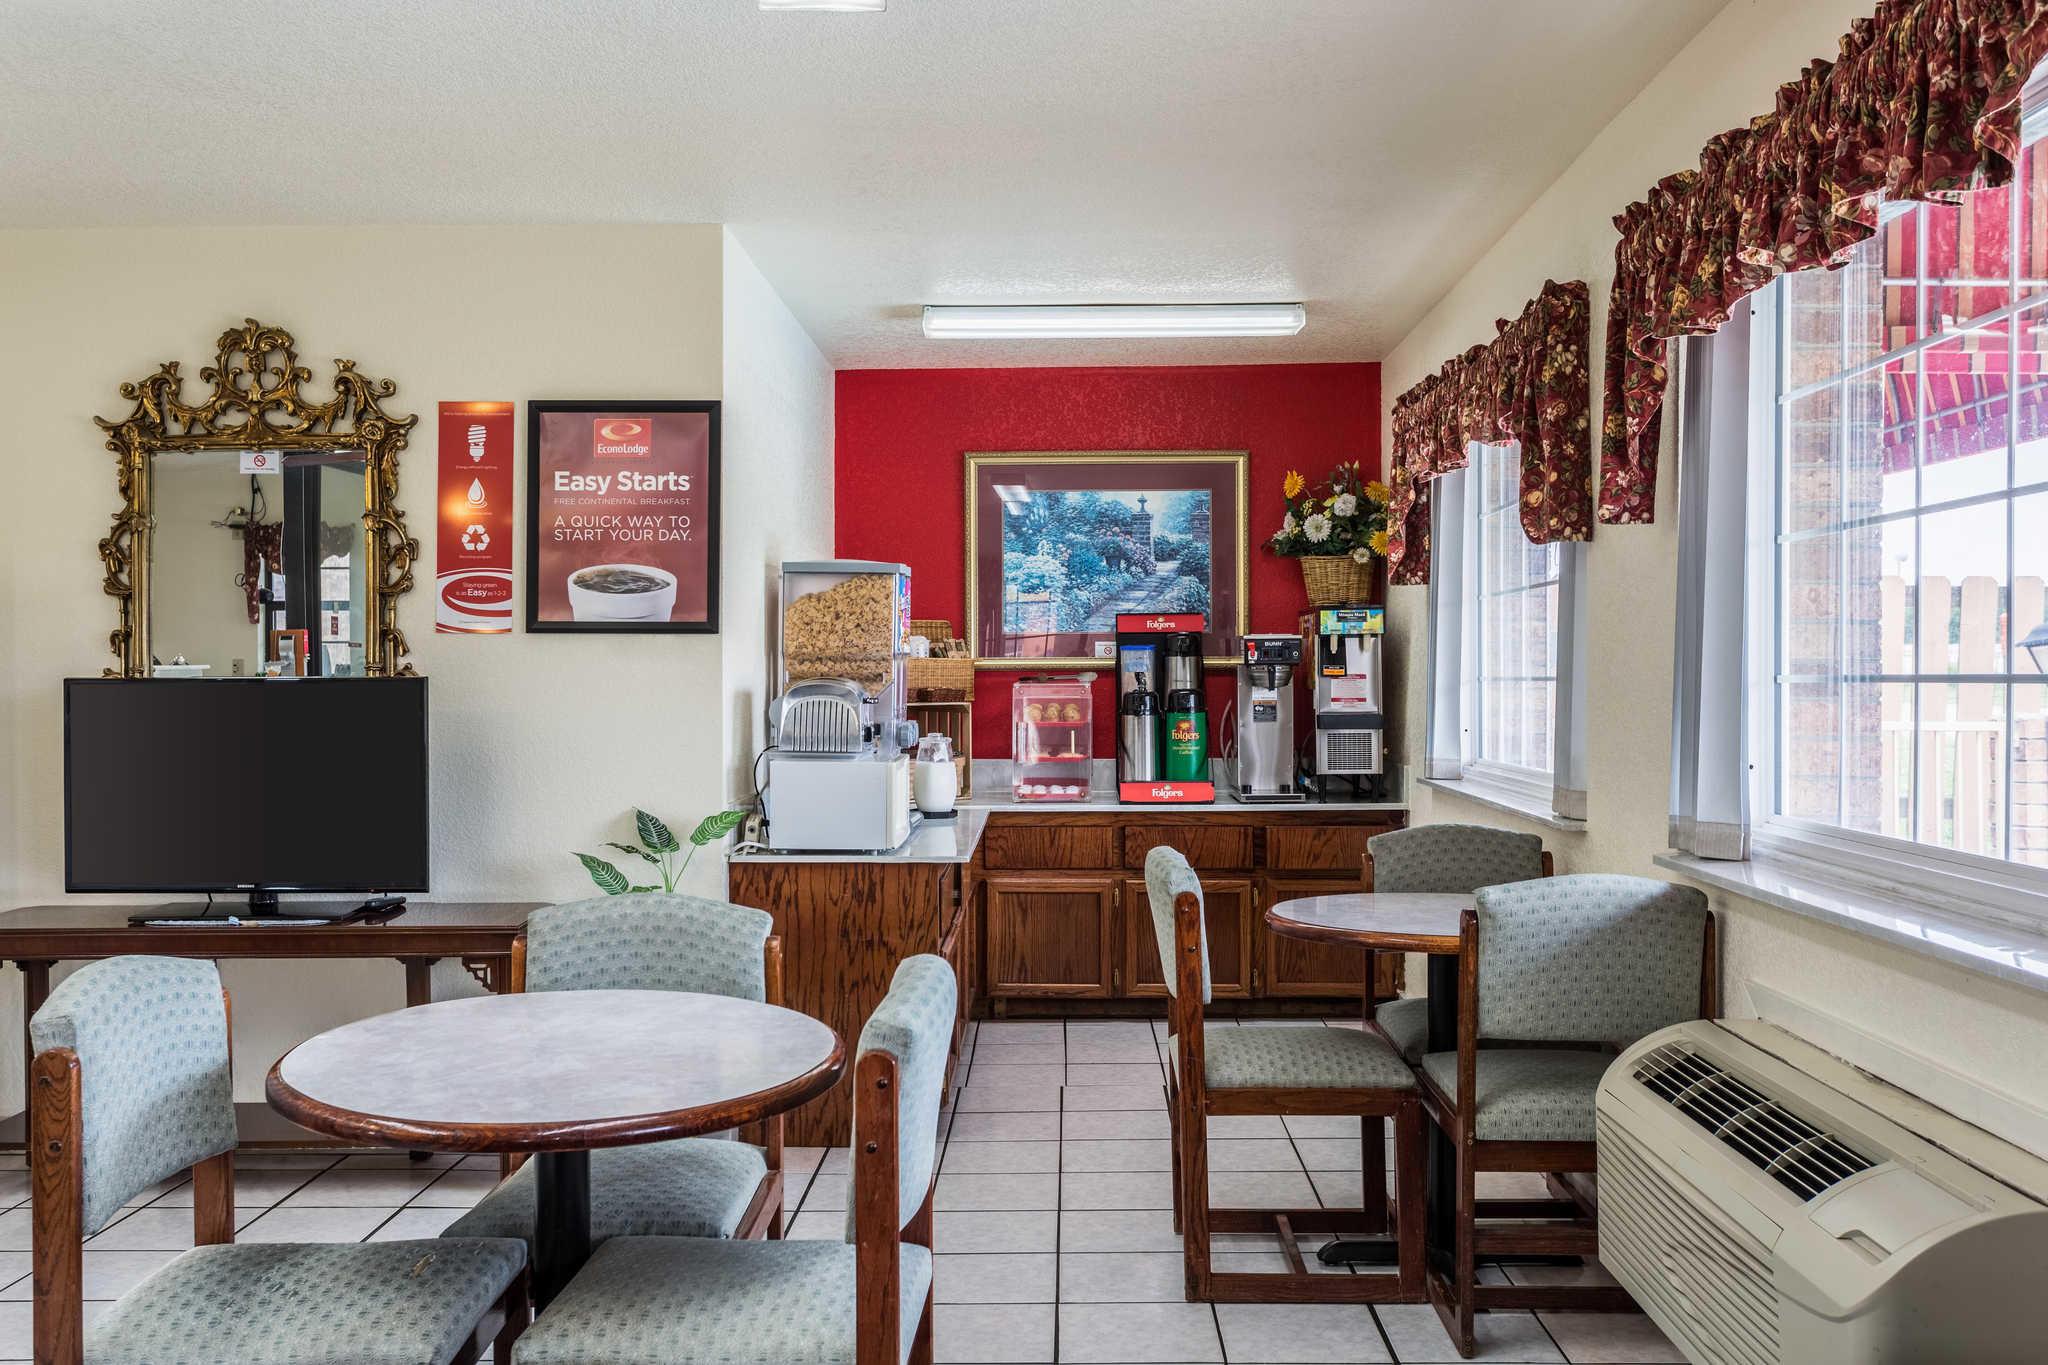 Econo Lodge & Suites image 20